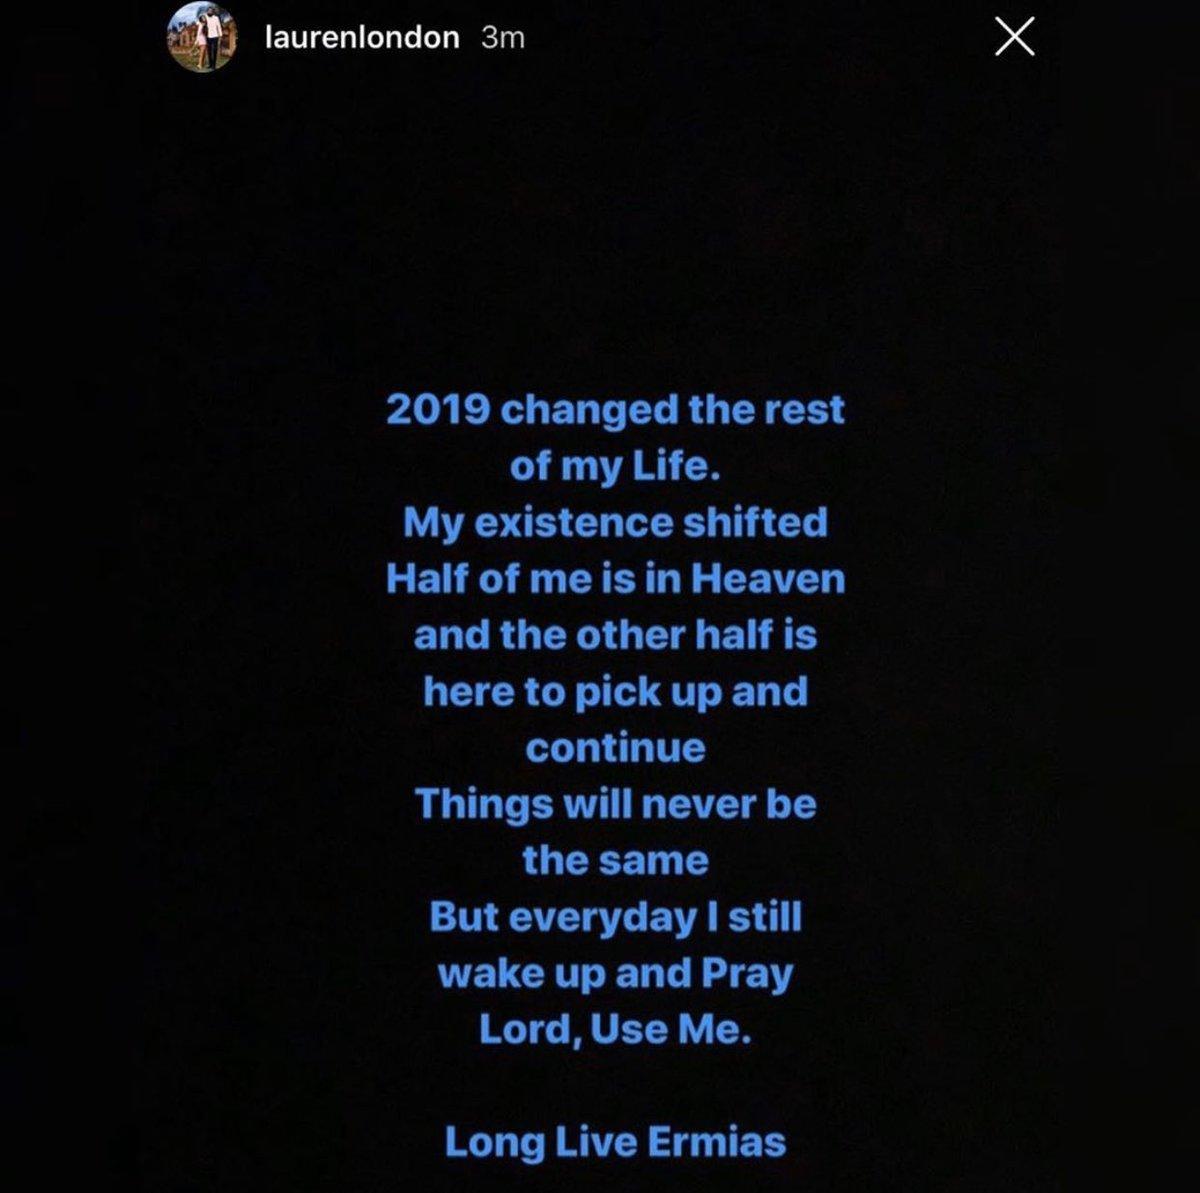 #LaurenLondon speaks about her feelings and the difficulties of #2019  @LaurenLondon @NipseyHussle<br>http://pic.twitter.com/LwxzM8VvYG